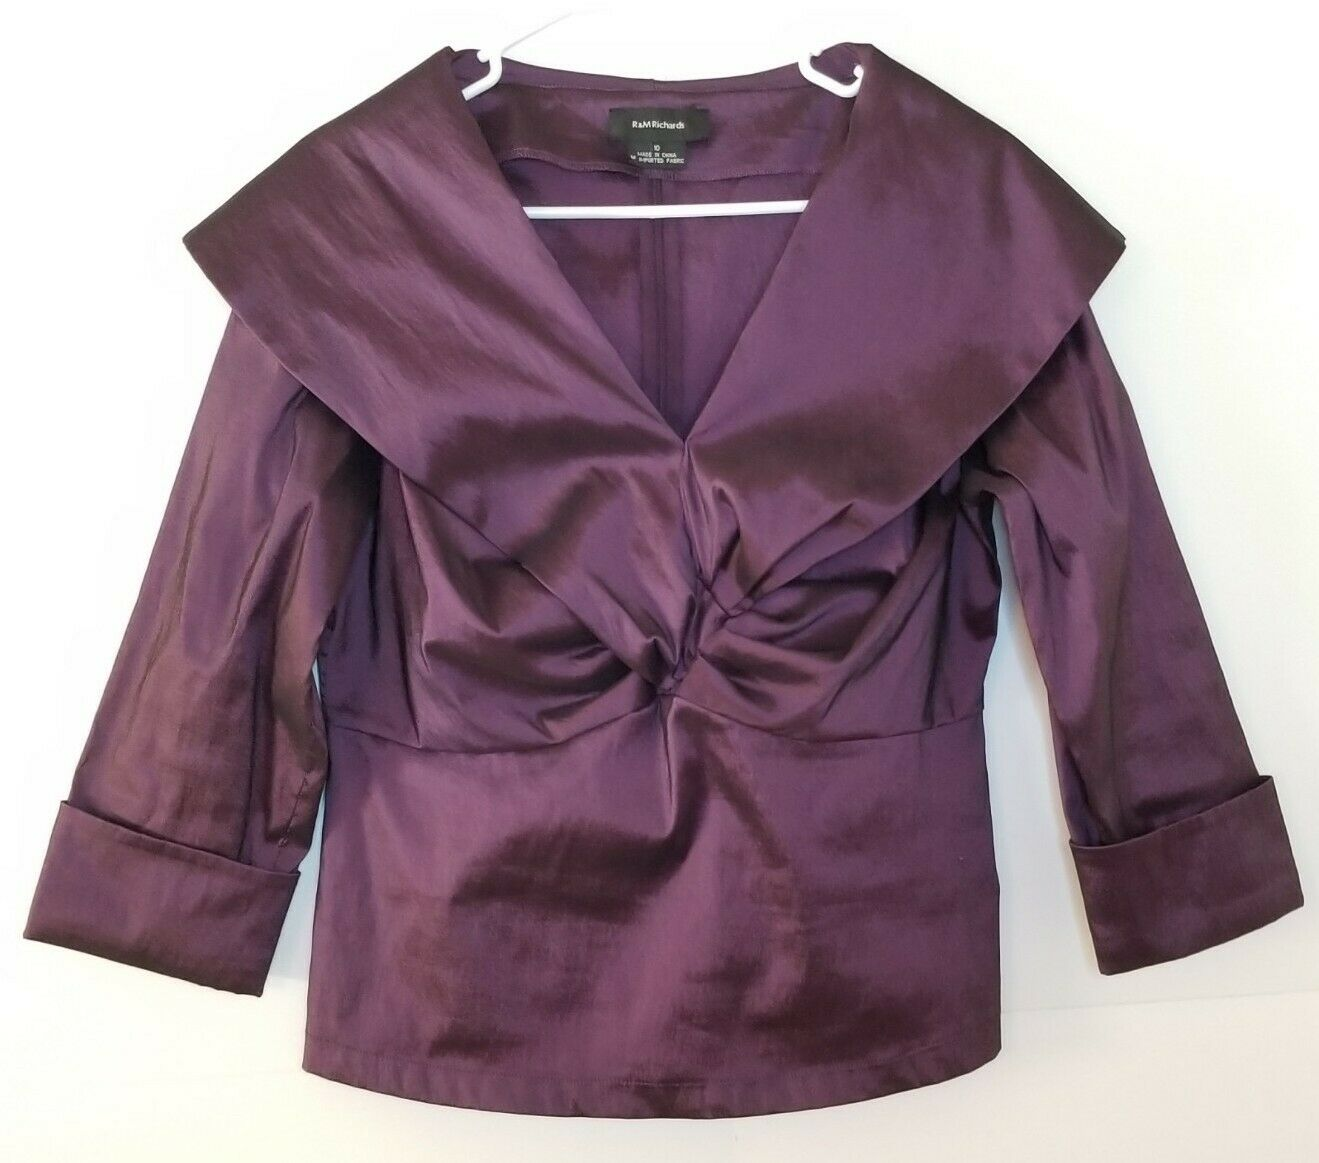 R&M Richards Evening Wear Lg Collar 3/4 Sleeve Back Zip Top Womens Sz 10 Purple